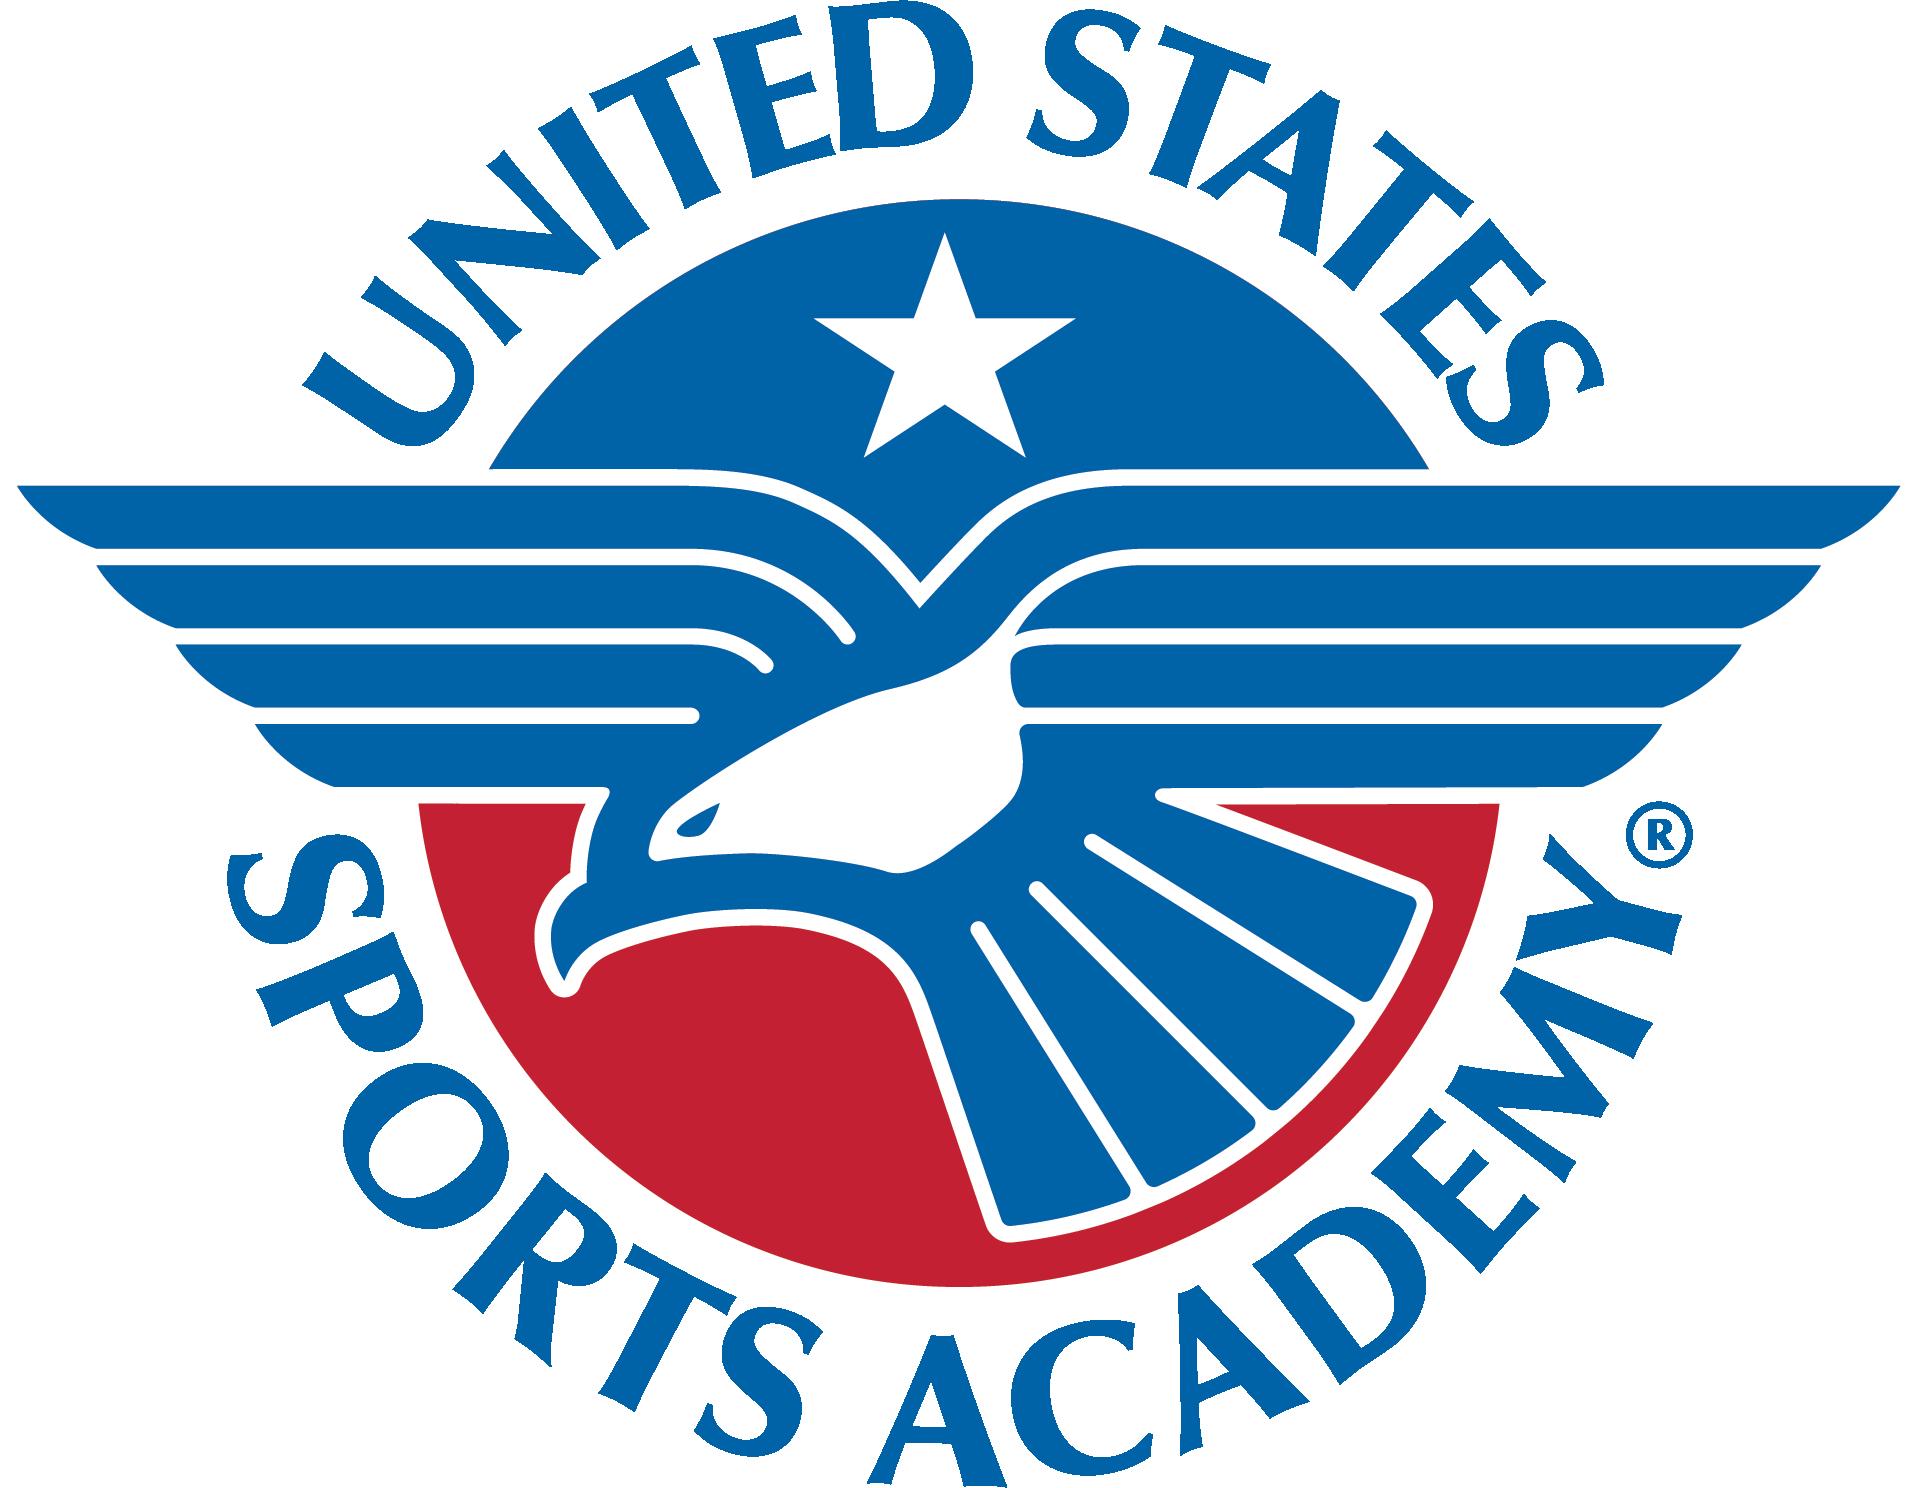 Sports acedmy logo